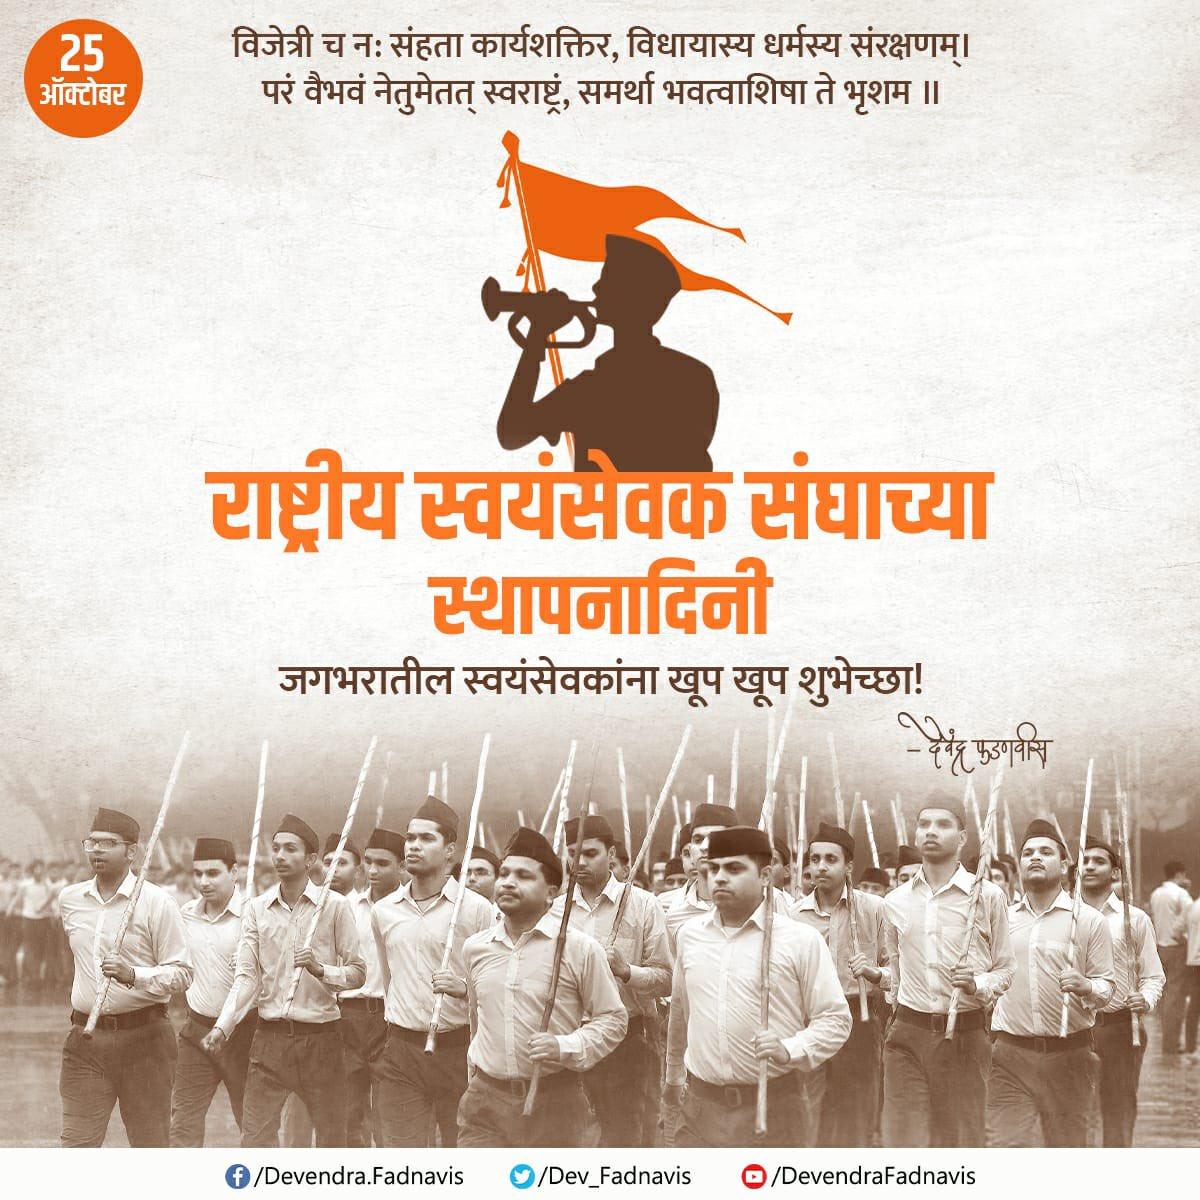 परं वैभवं नेतुमेतत् स्वराष्ट्रं This one line defines entire work & mission of @RSSorg ! Heartiest greetings to all the SwayamSevaks across the globe on Rashtriya SwayamSevak Sangh on Foundation Day! #RSSVijayaDashmi https://t.co/kDsTmlOXC6